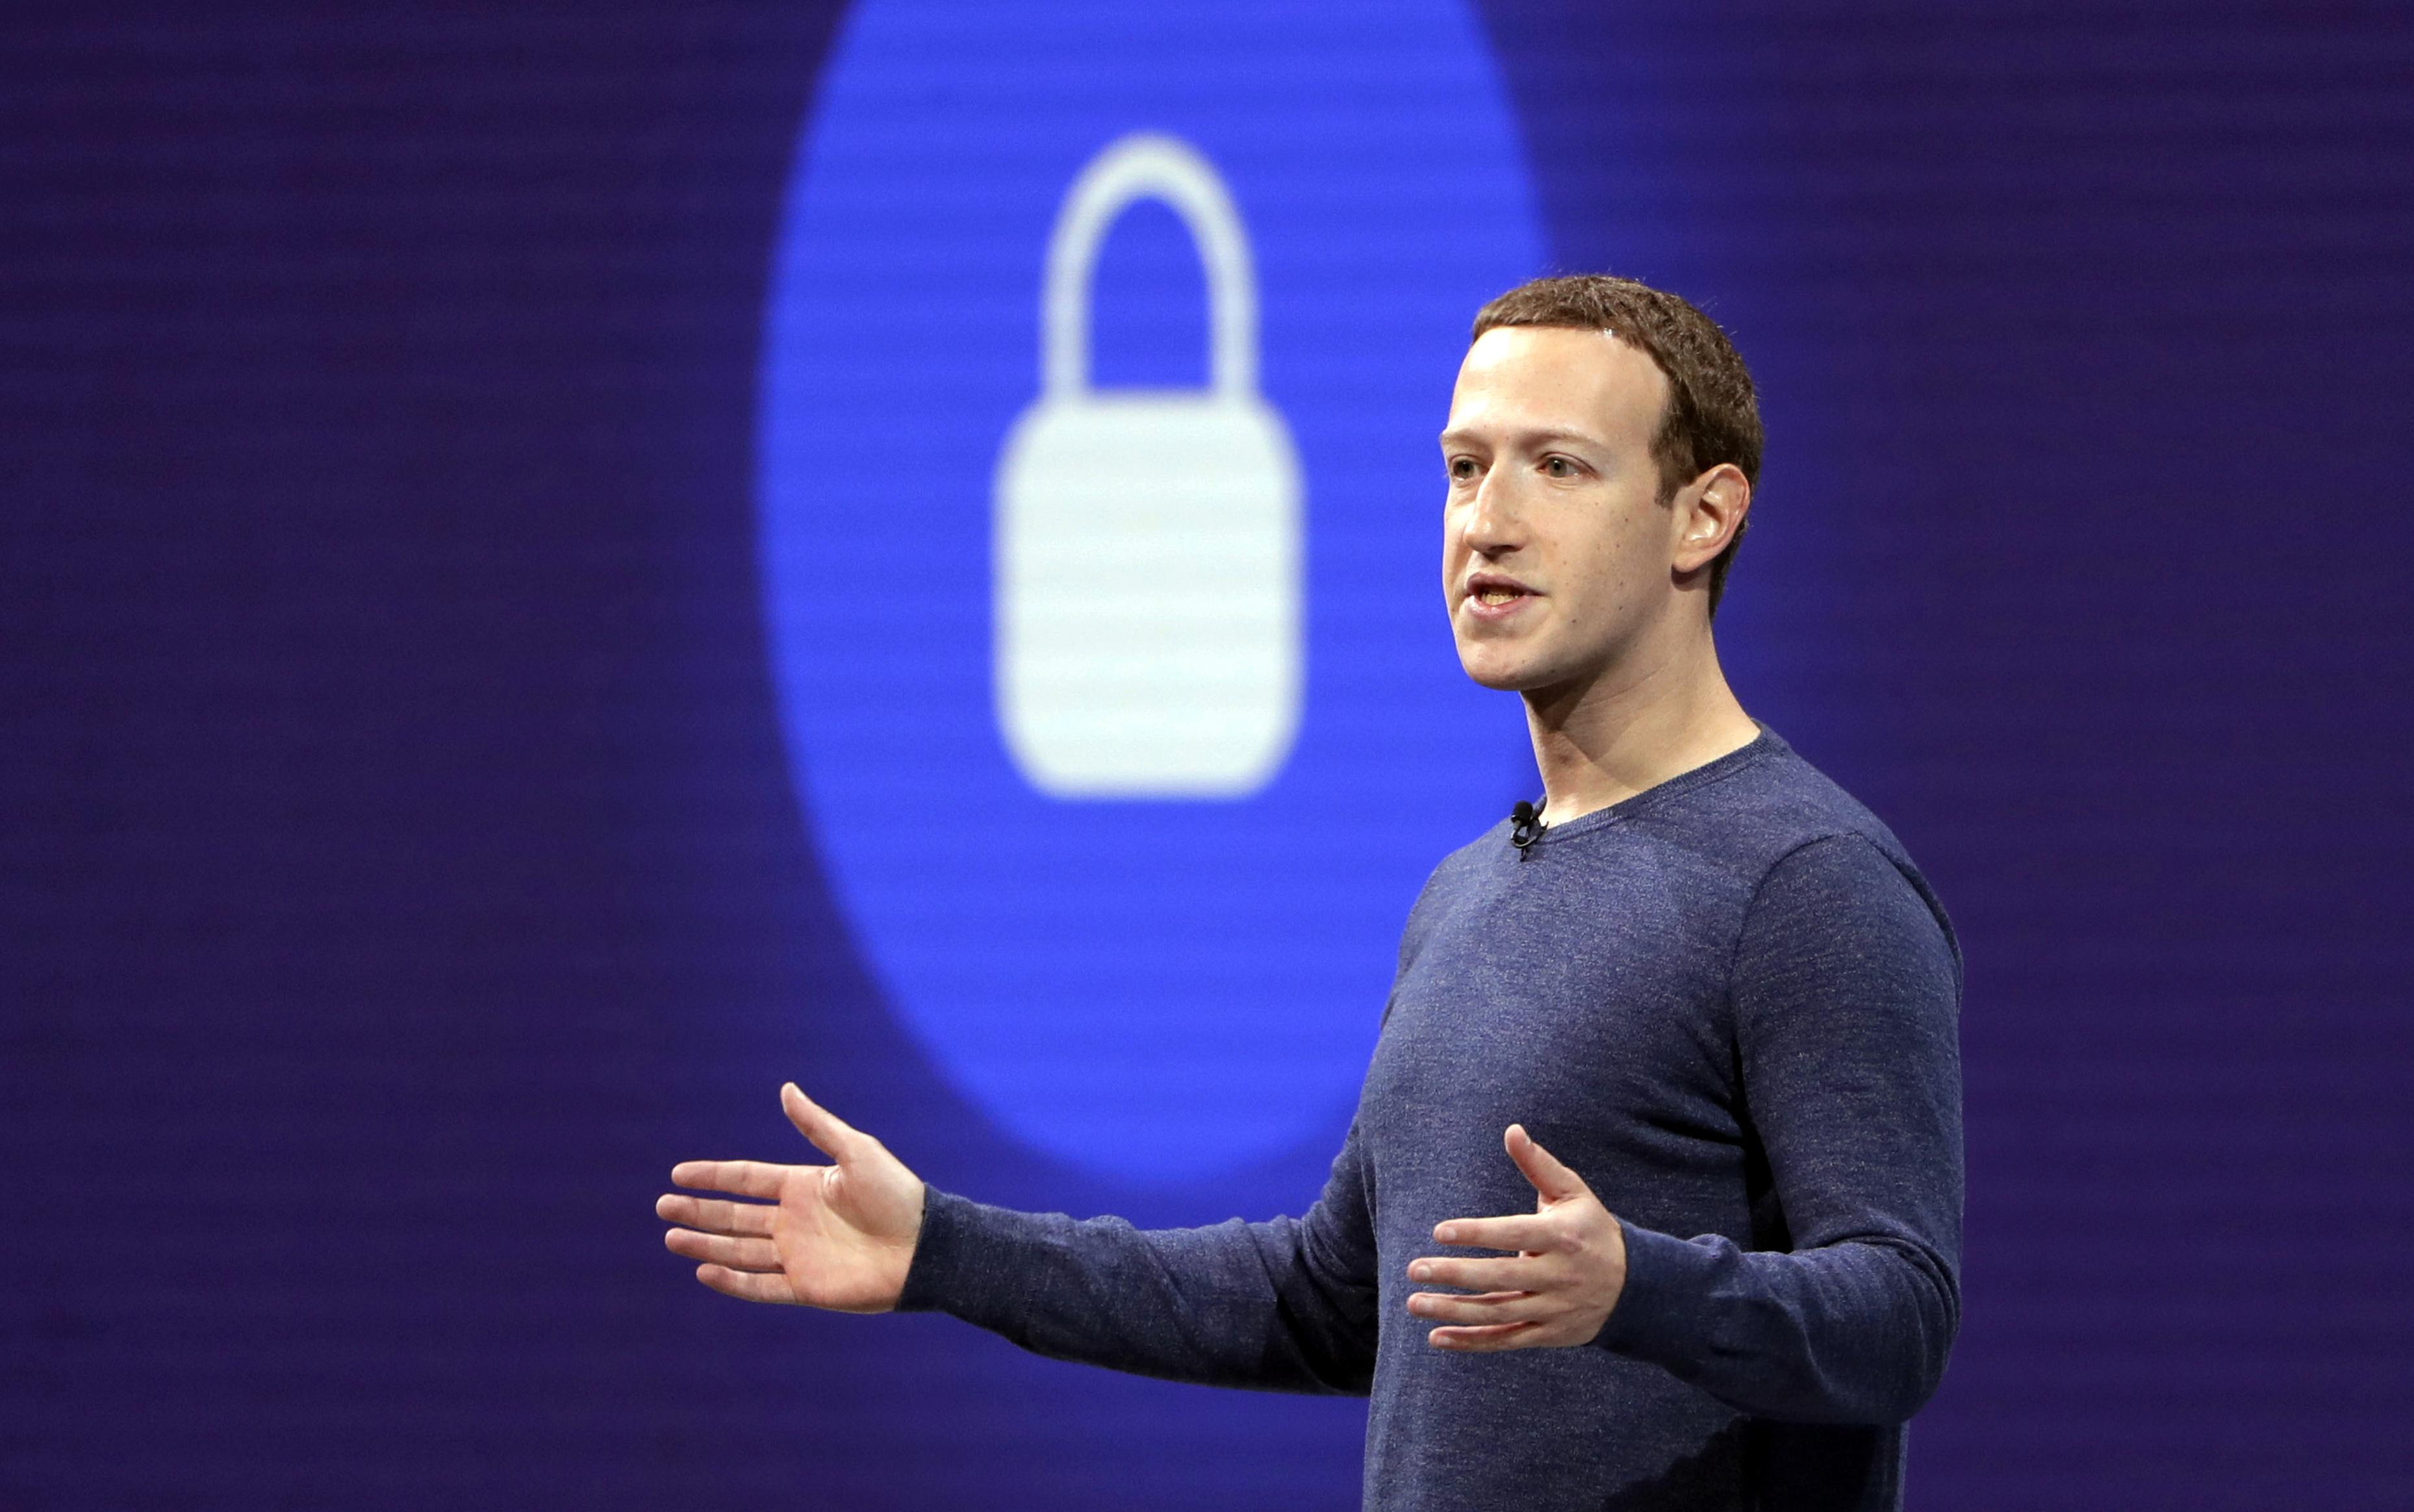 FTC focusing on Mark Zuckerberg in Facebook probe: Reports